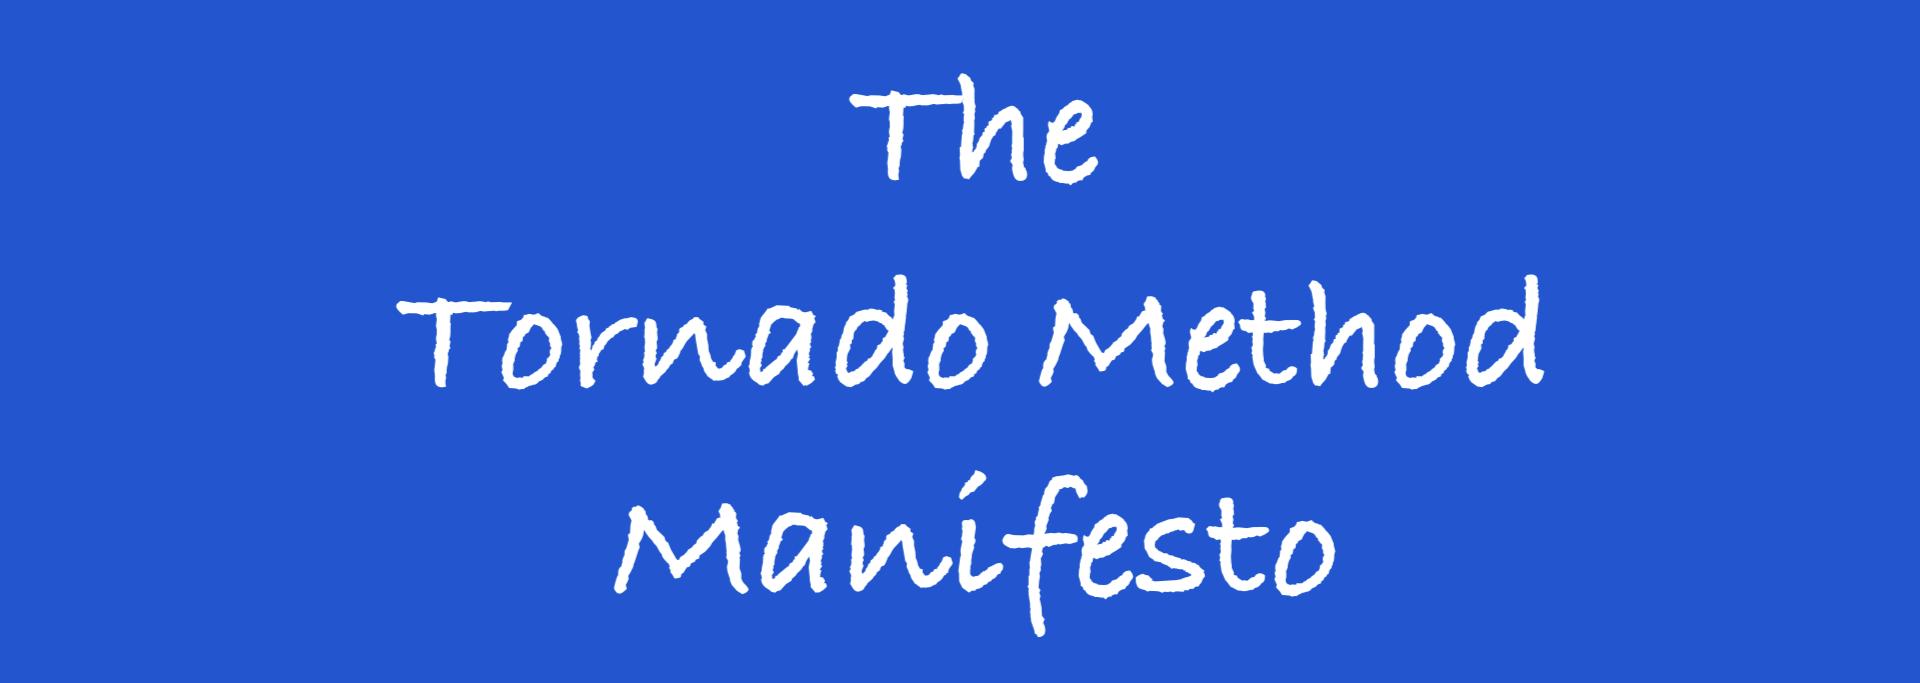 Tornado-Method-Manifesto-header.68129985033843a0a4224ee34309c851.png